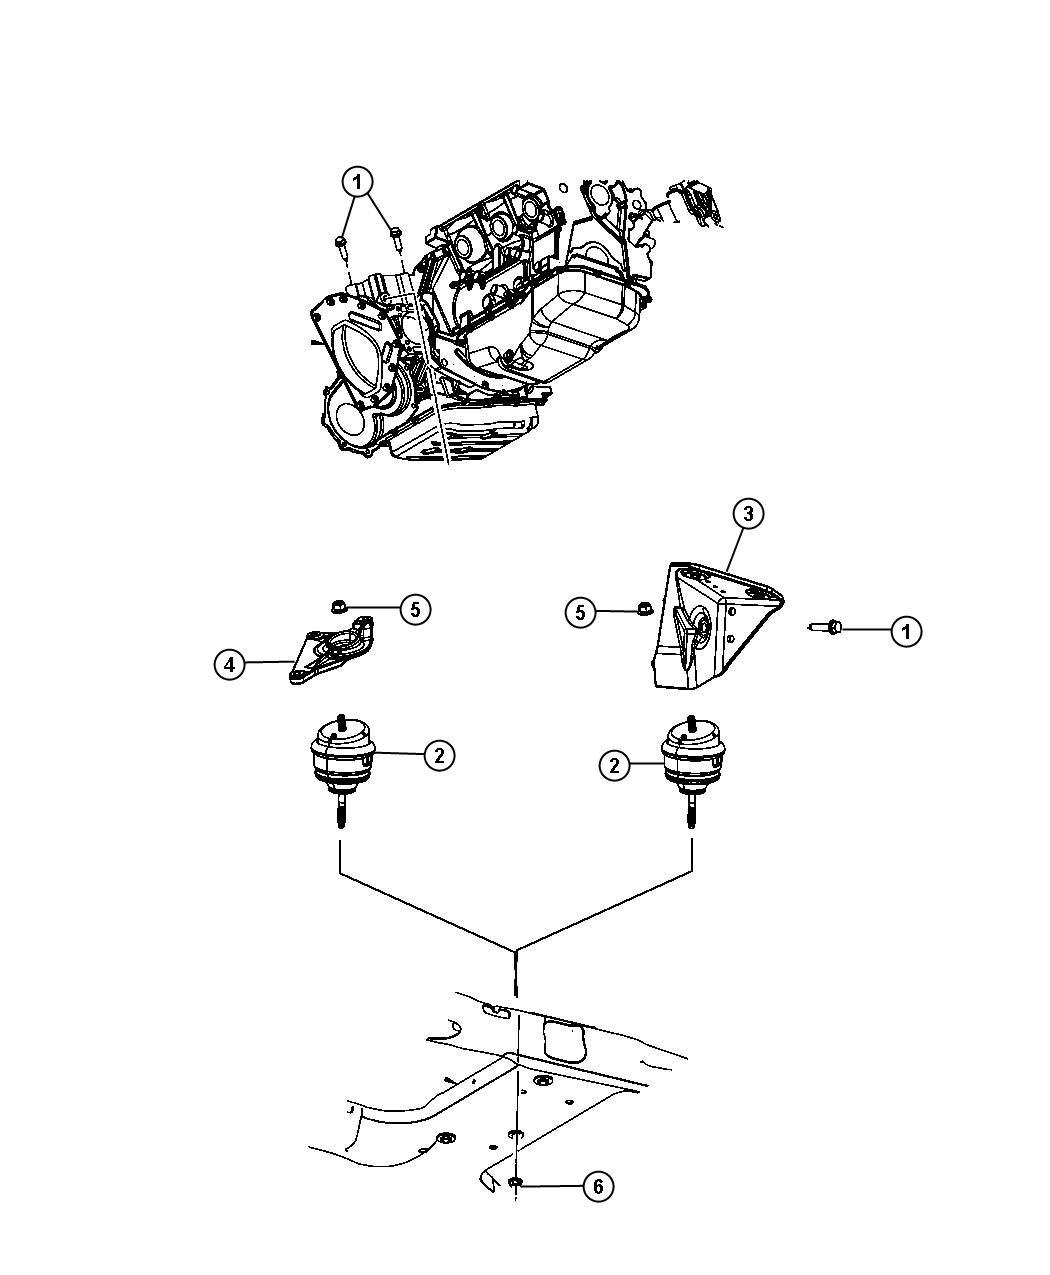 hight resolution of p 0900c1528003c186 as well chrysler pacifica motor mount diagram moreover chrysler 3 3l